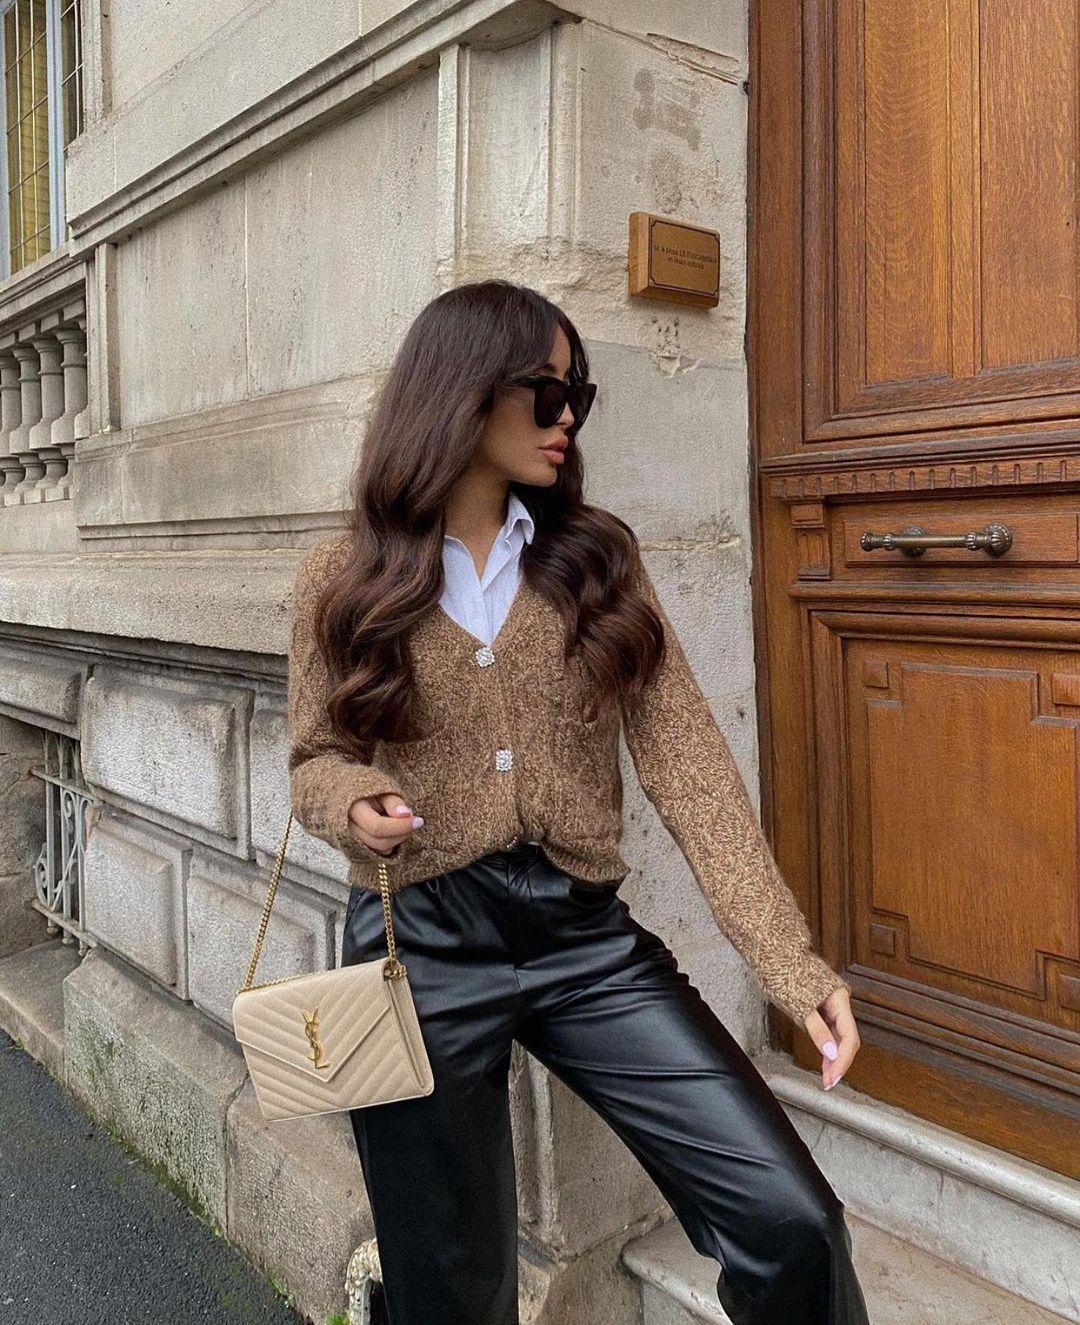 cropped jacket with jewel button de Zara sur zaraaddiction